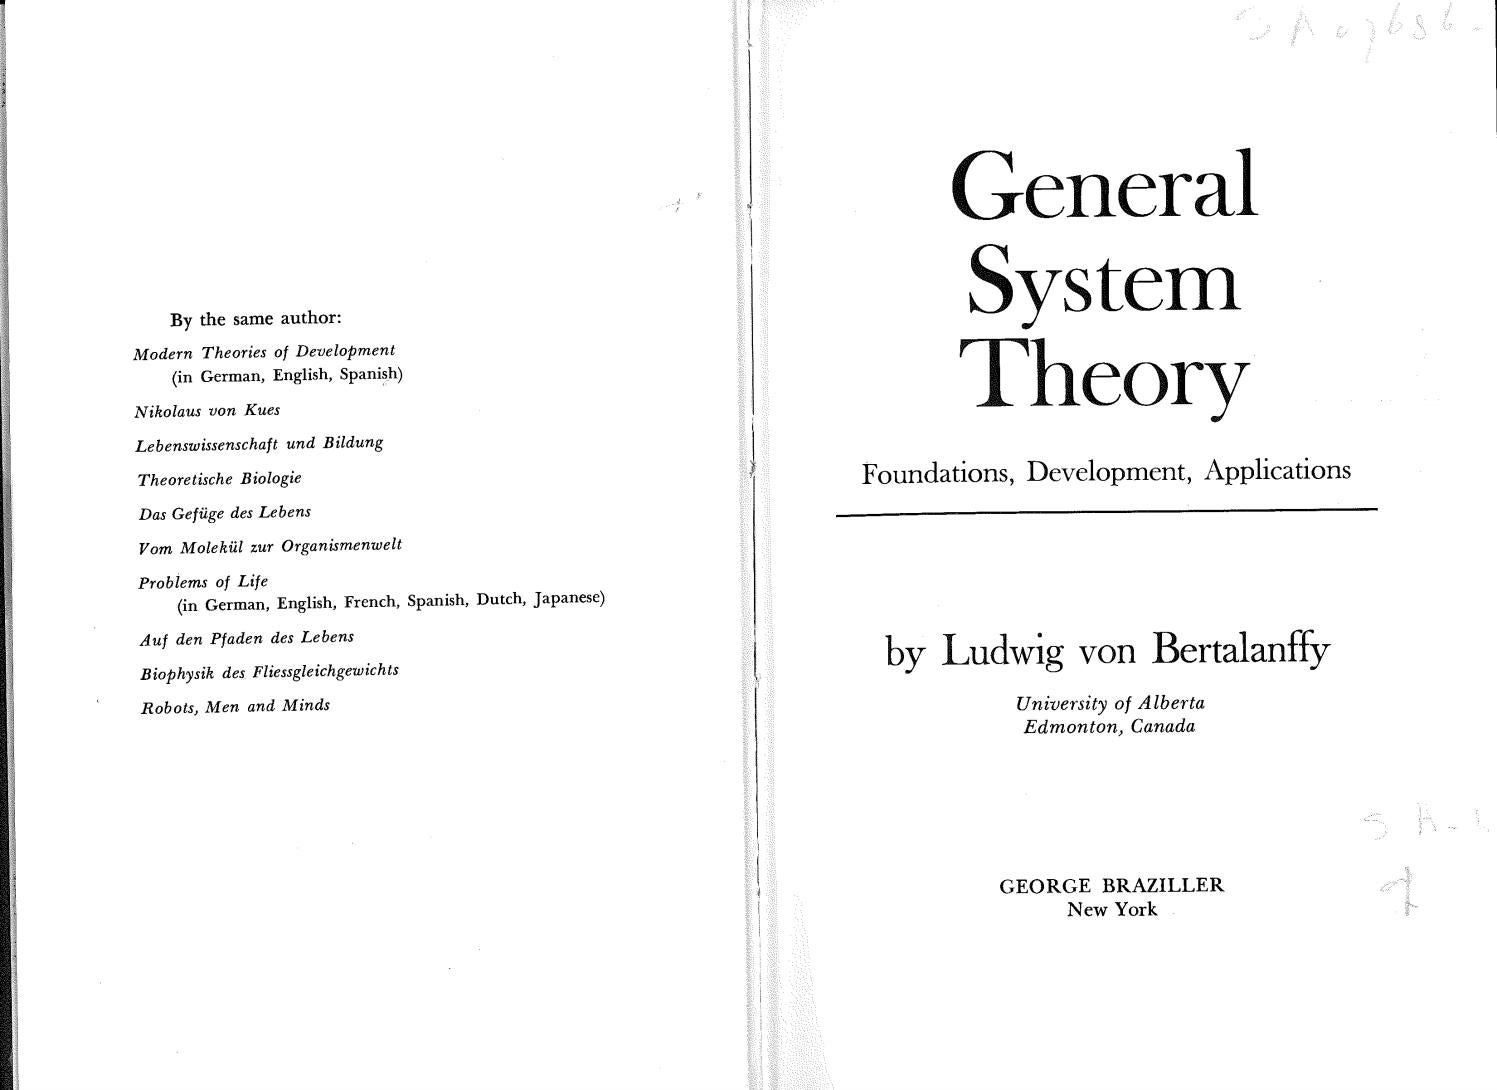 Von bertalanffy ludwig general system theory 1968 by Julio Efraín ...